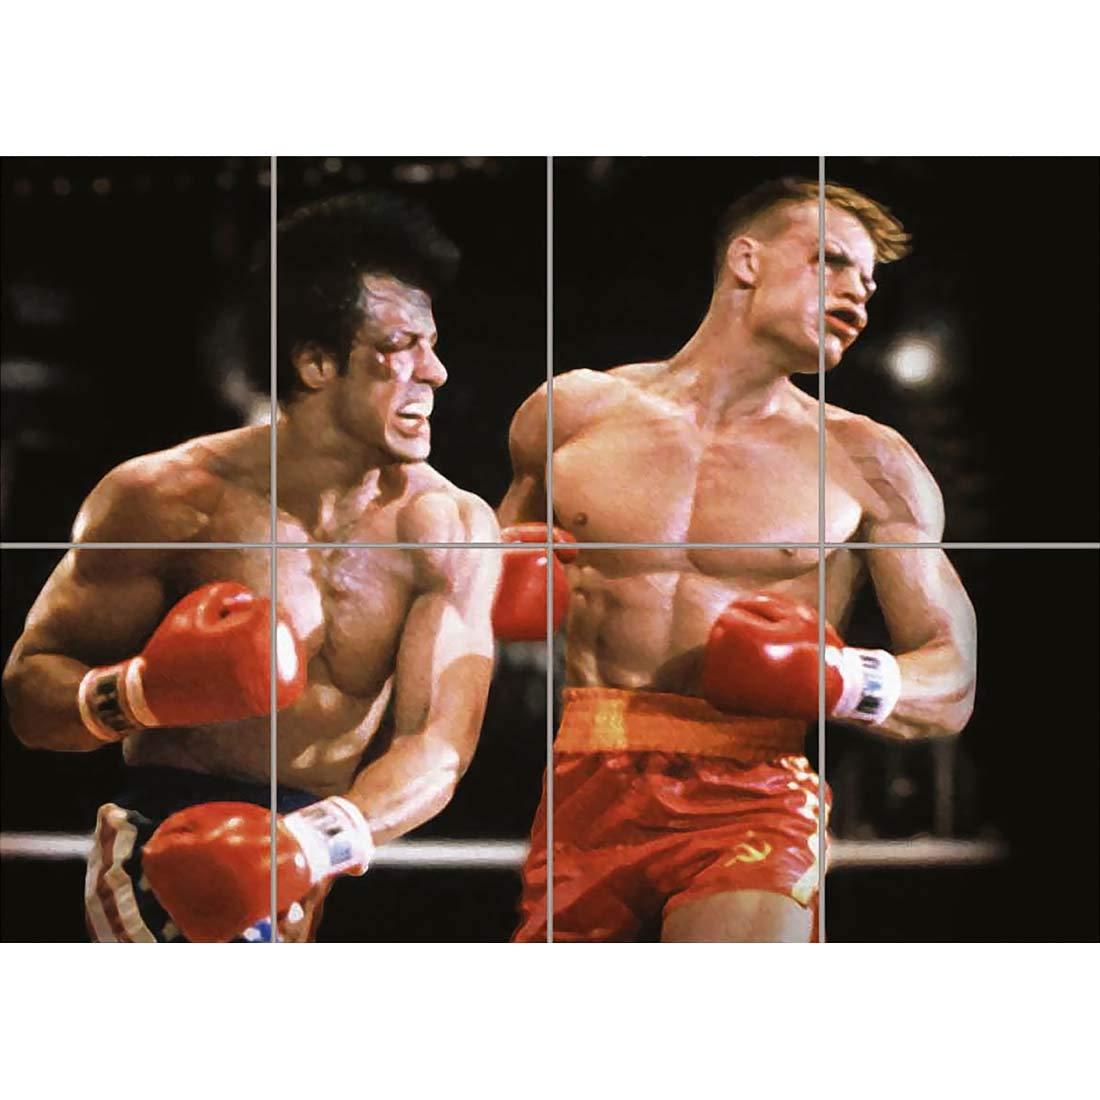 Doppelganger33 LTD Rocky IV 4 Giant Poster Picture Print X3106